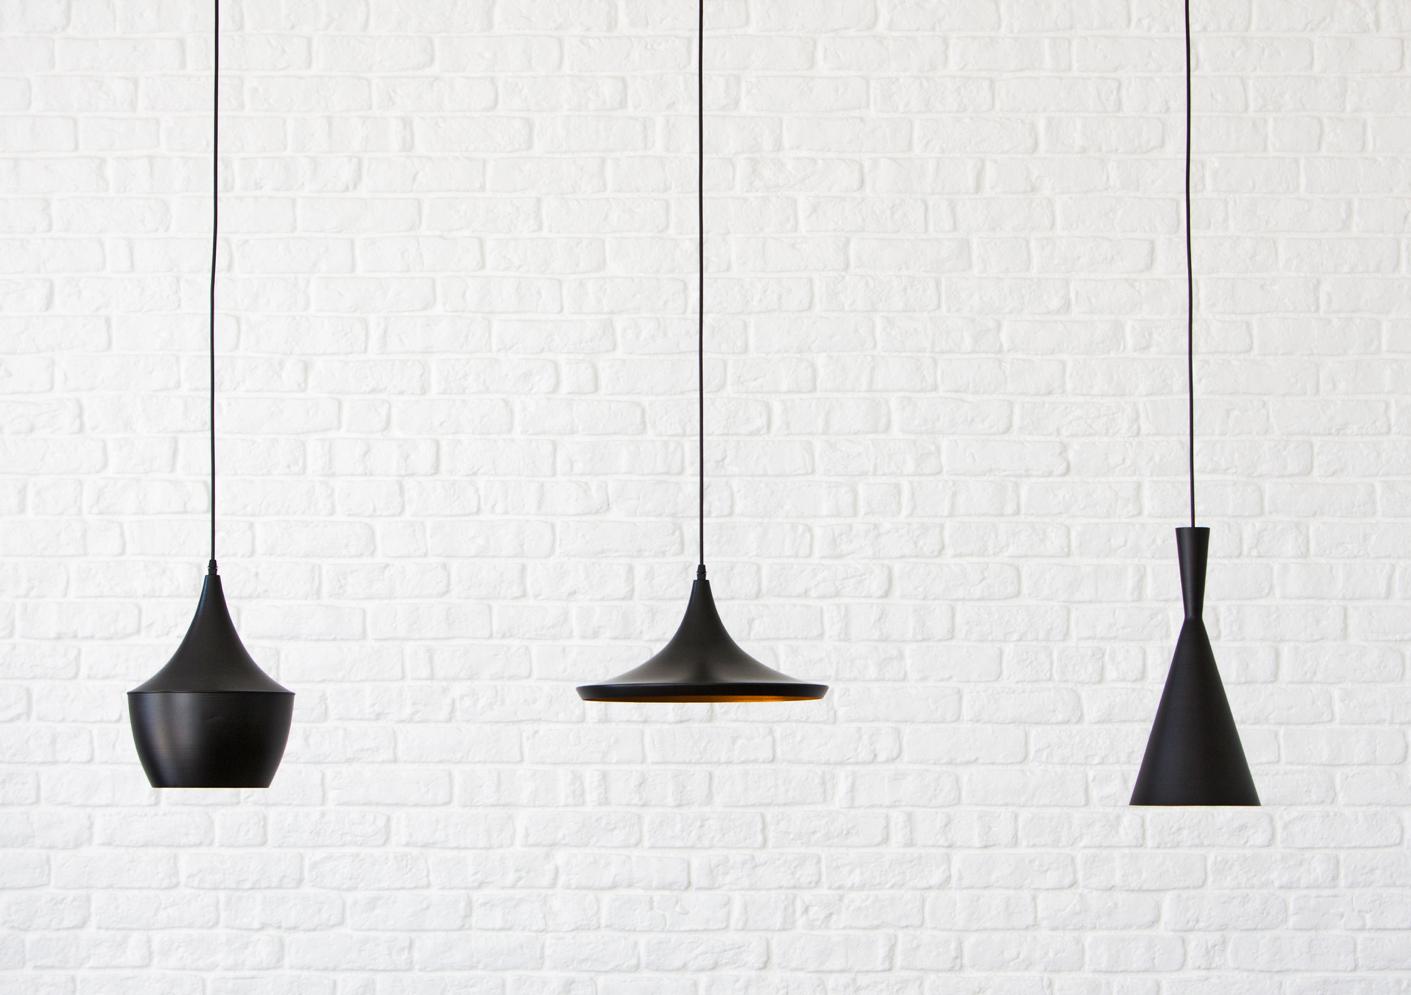 content-story-black-lamps